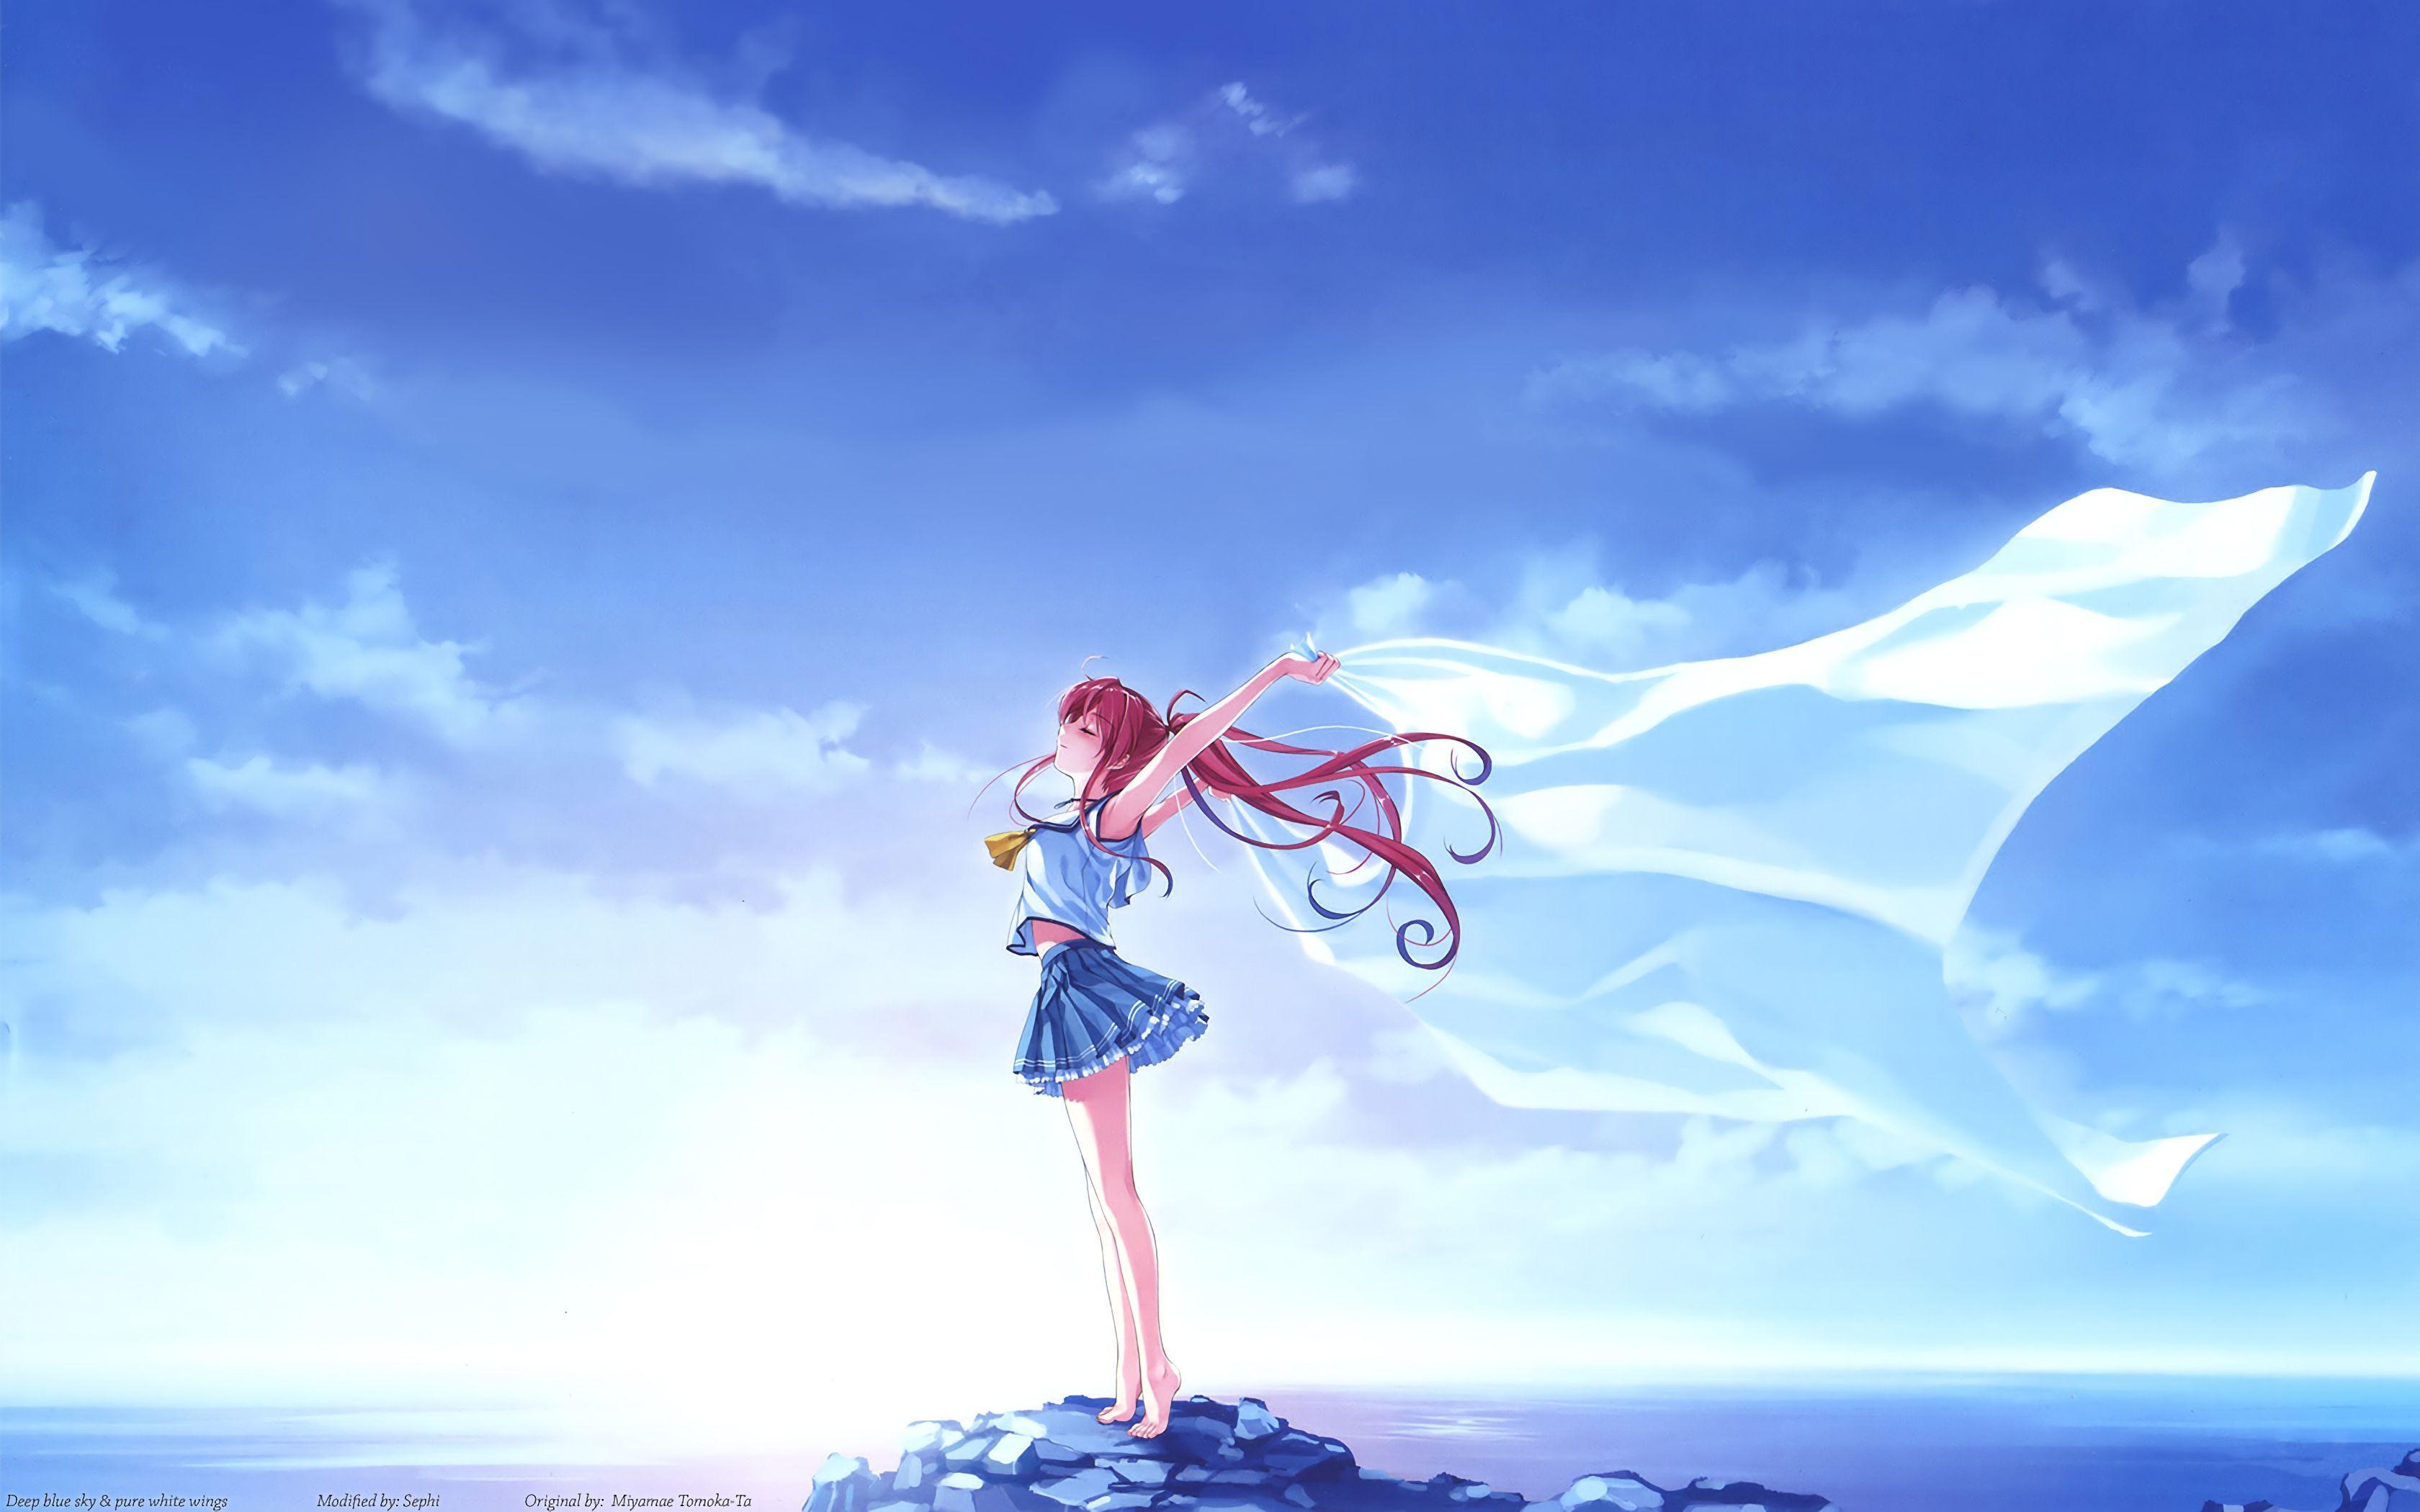 Anime Blue 4k Wallpapers - Top Free Anime Blue 4k ...